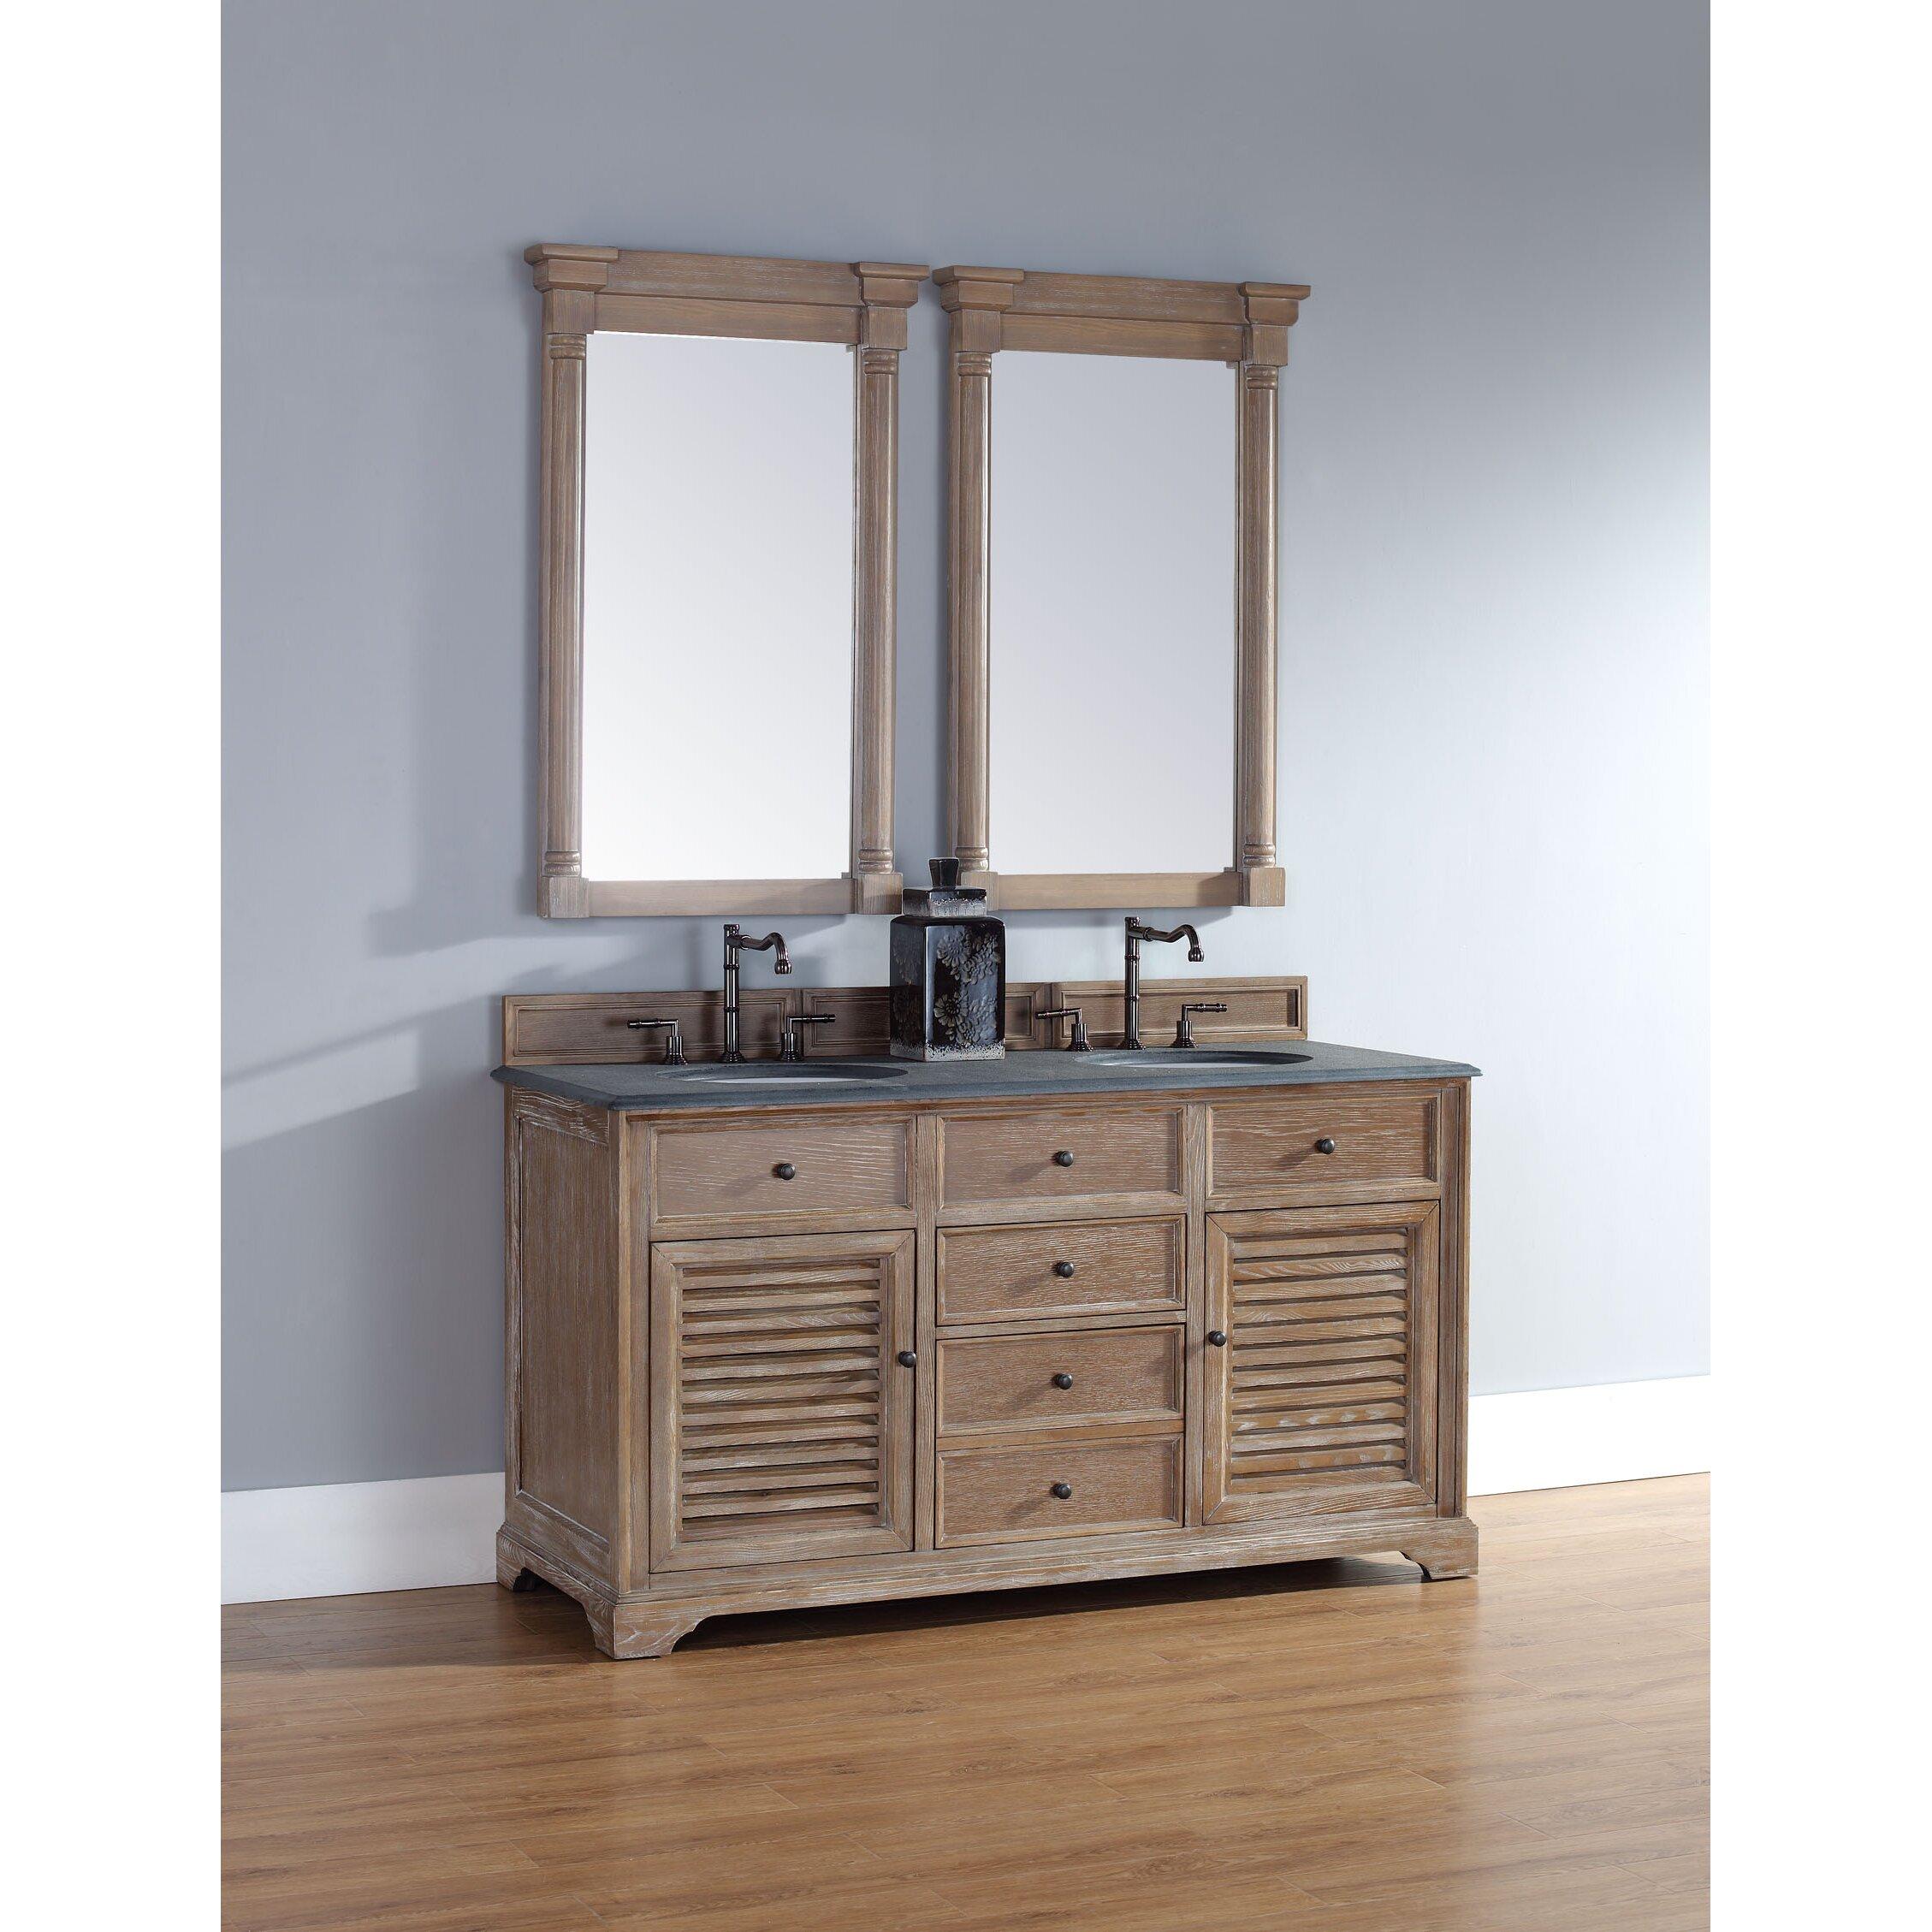 James Martin Furniture Savannah 60 Double Bathroom Vanity